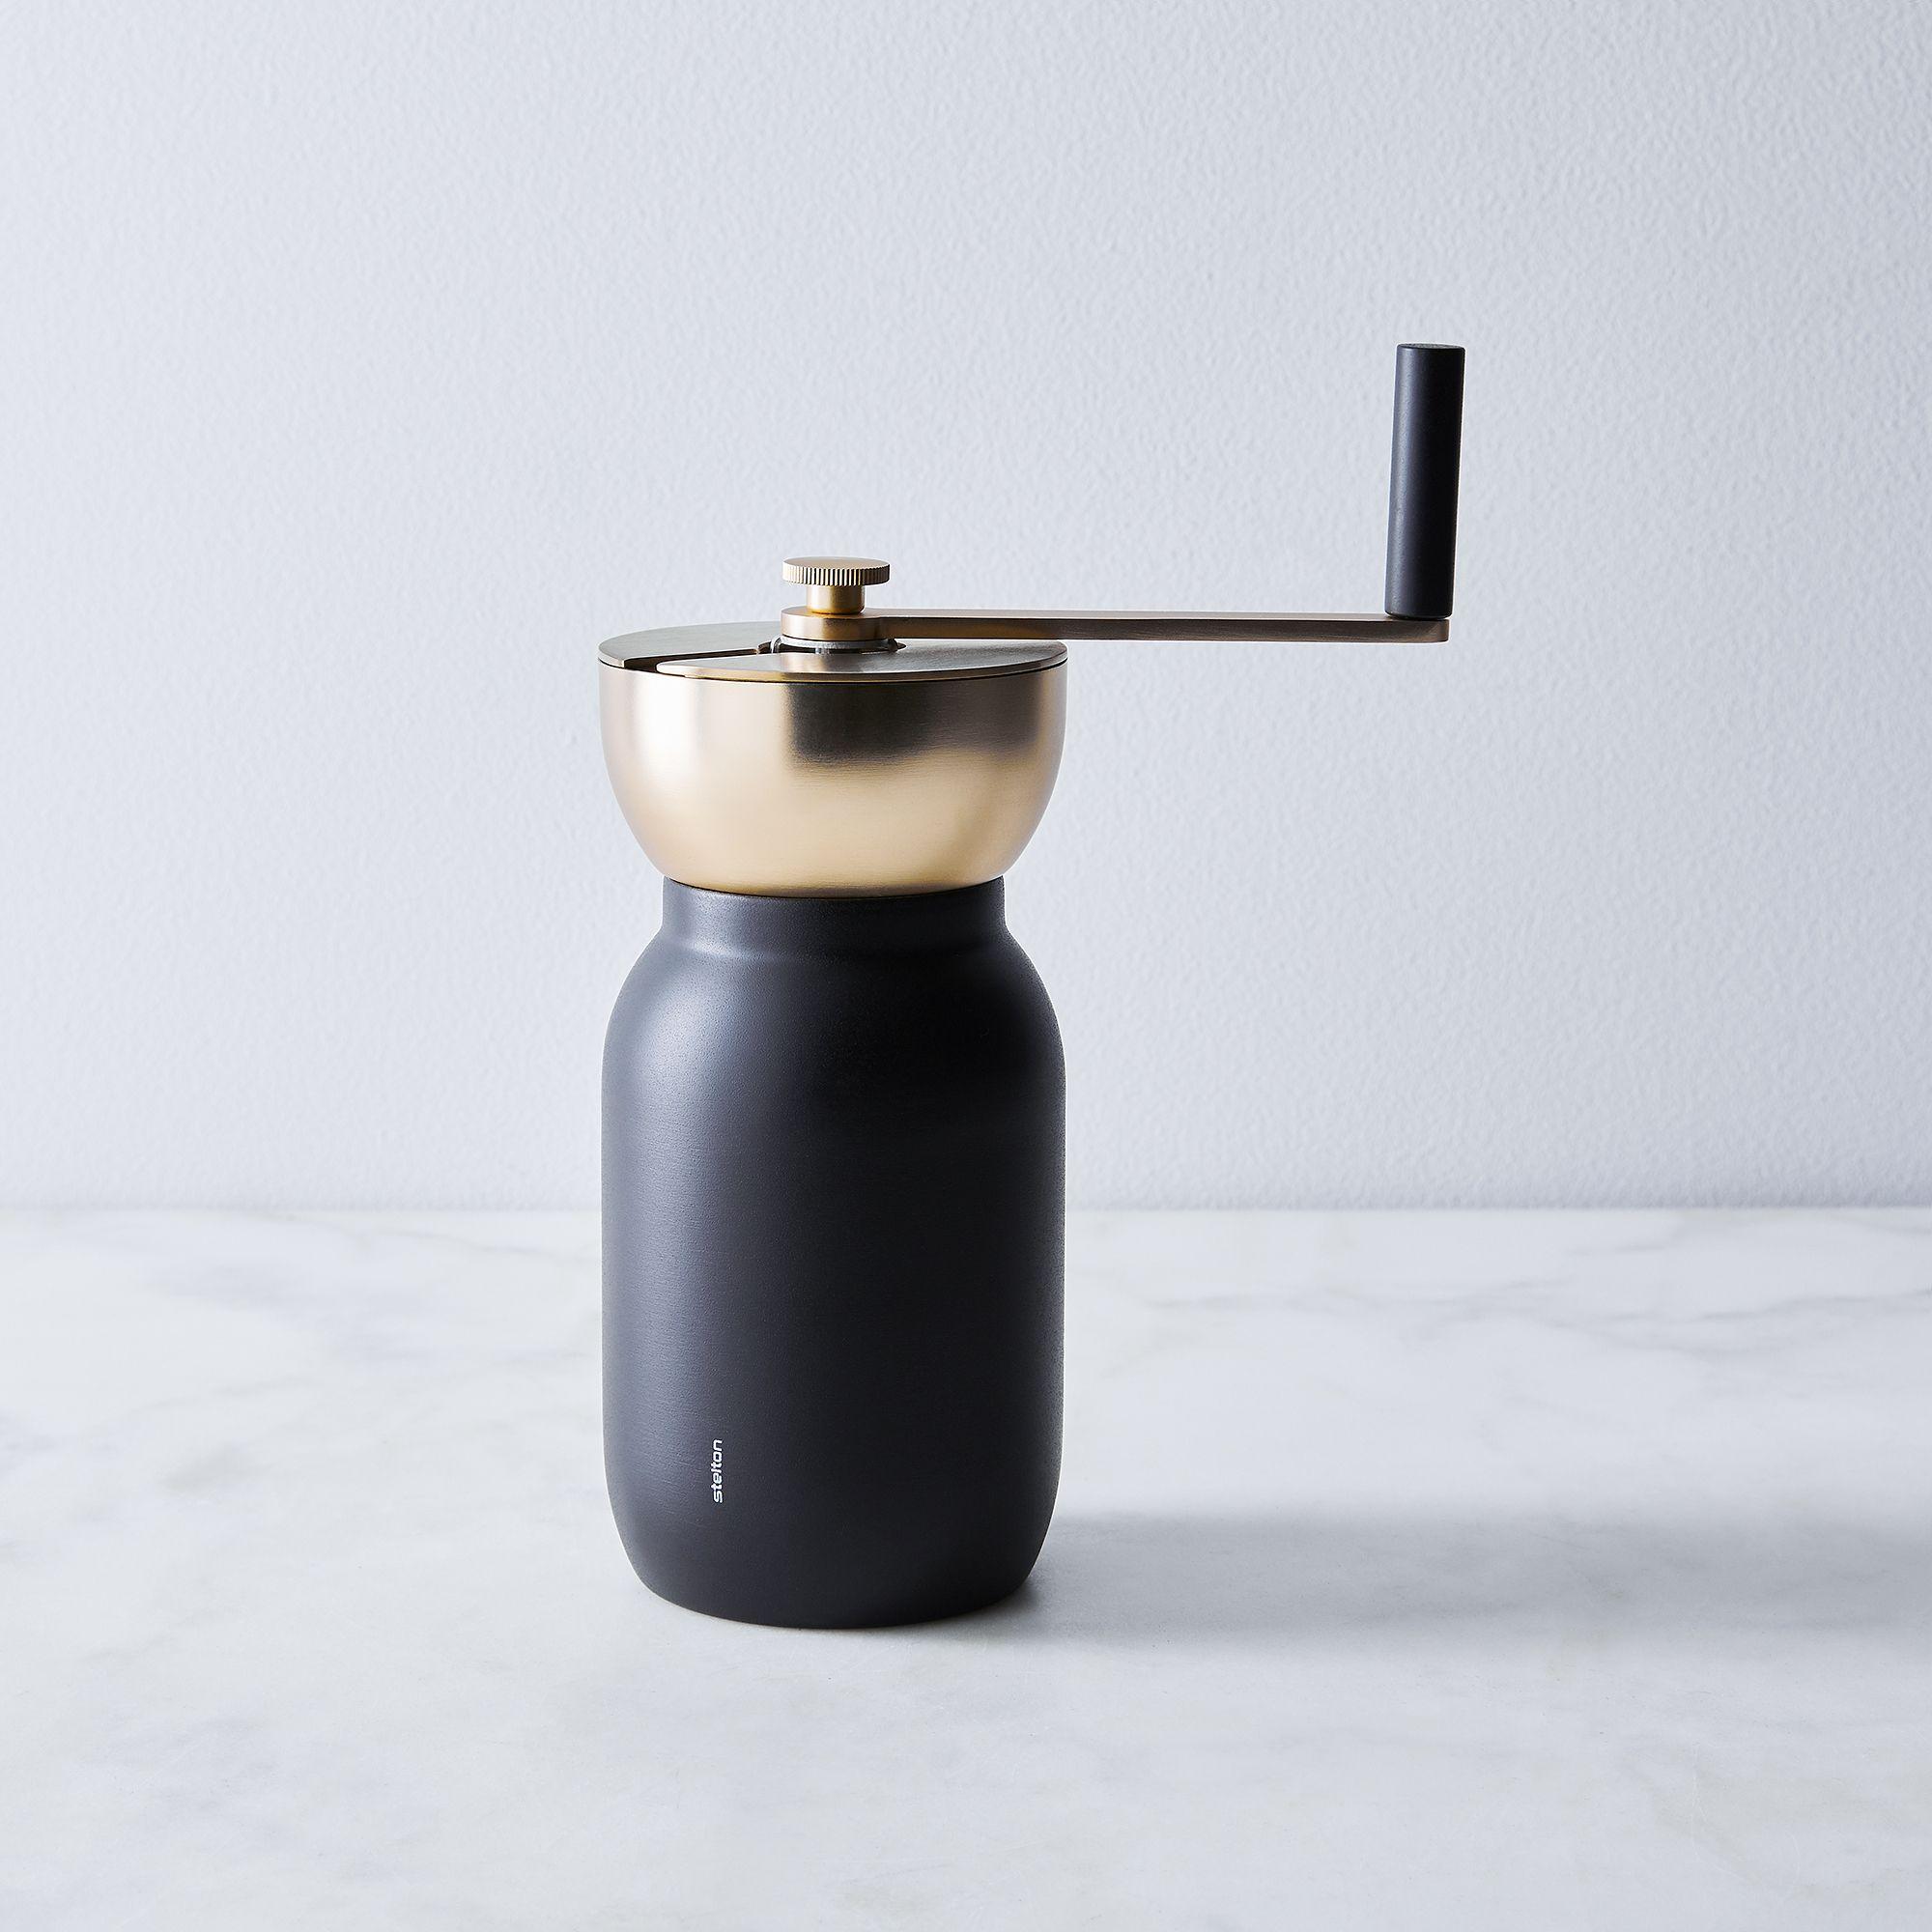 Coffee by megkrause